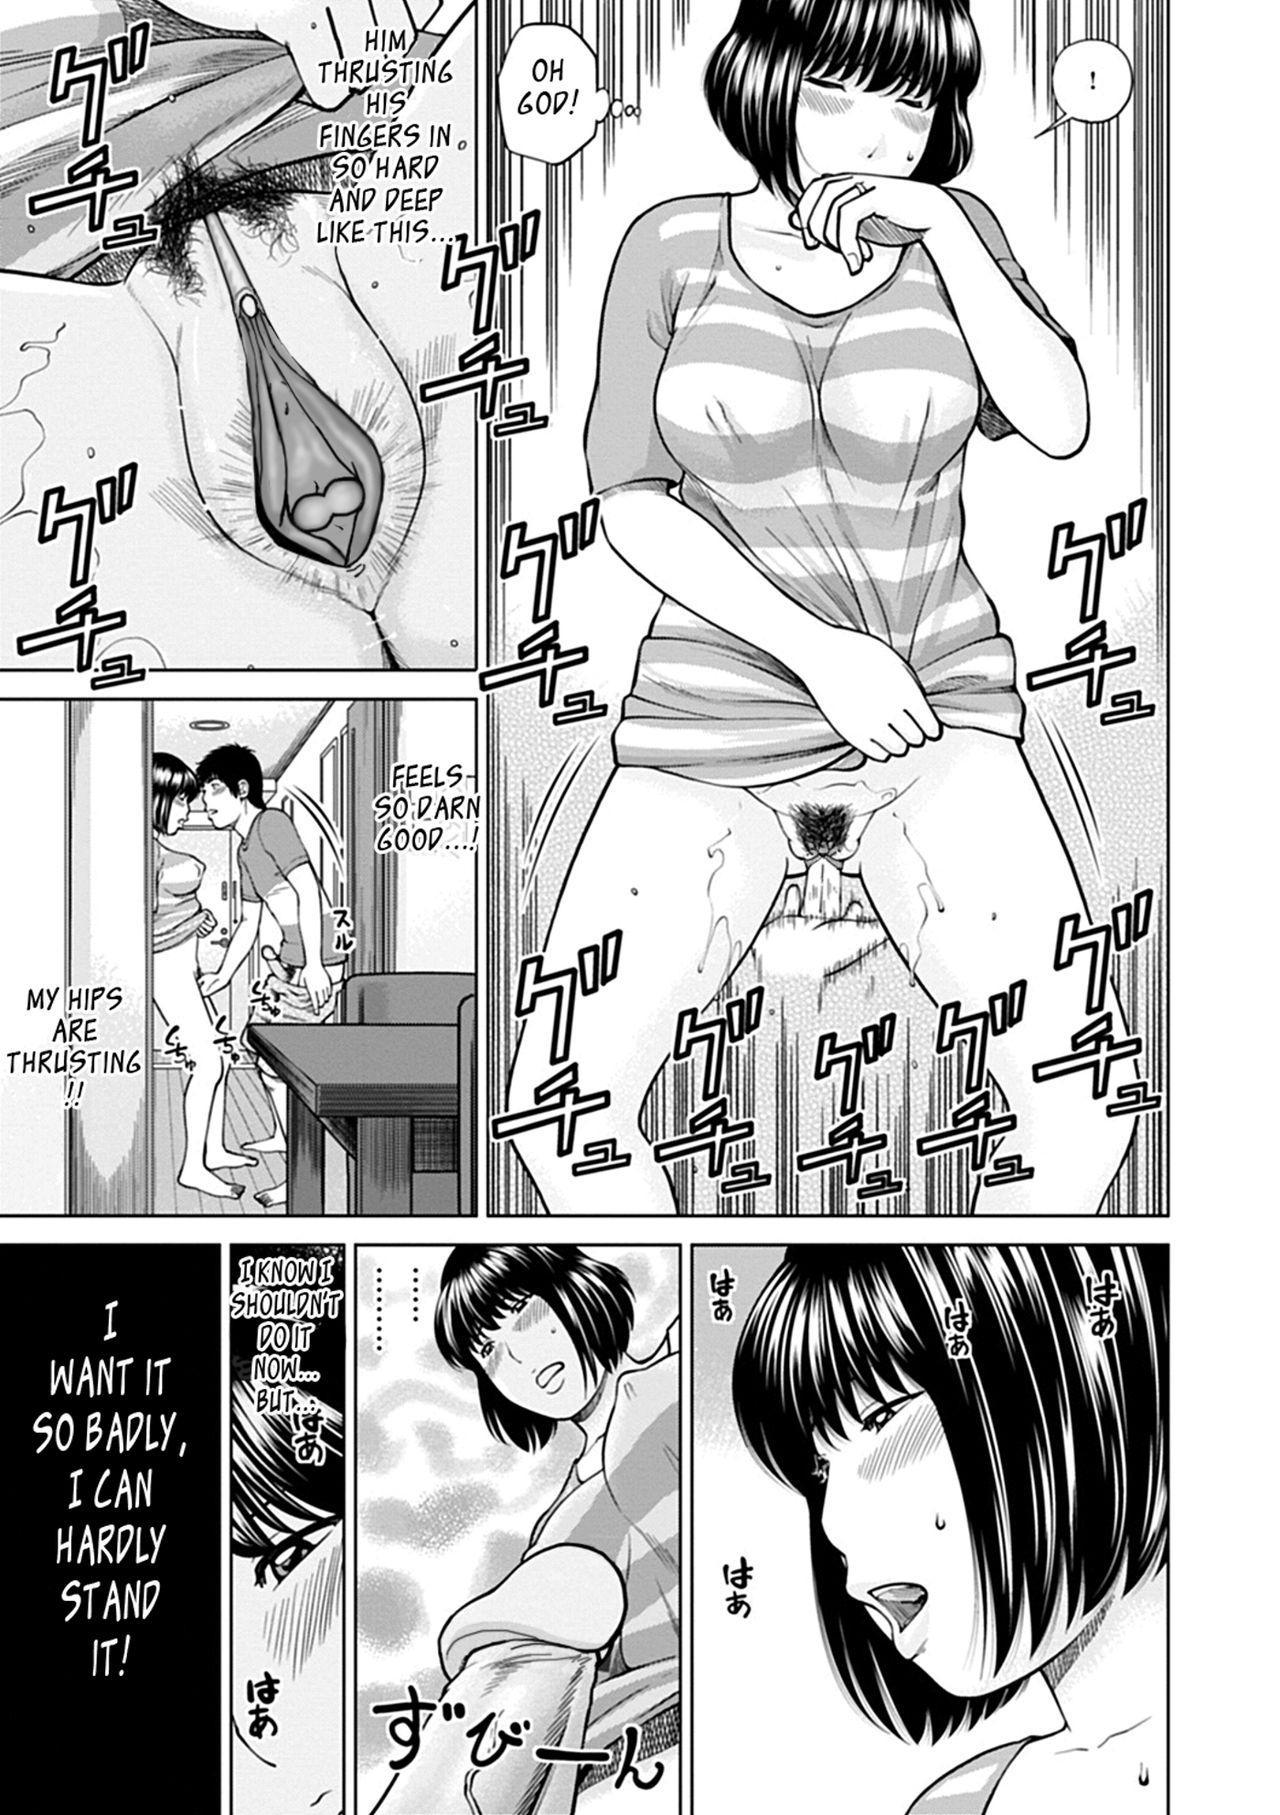 [Kuroki Hidehiko] 36-sai Injuku Sakarizuma | 36-Year-Old Randy Mature Wife [English] {Tadanohito} [Digital] [Uncensored] 148